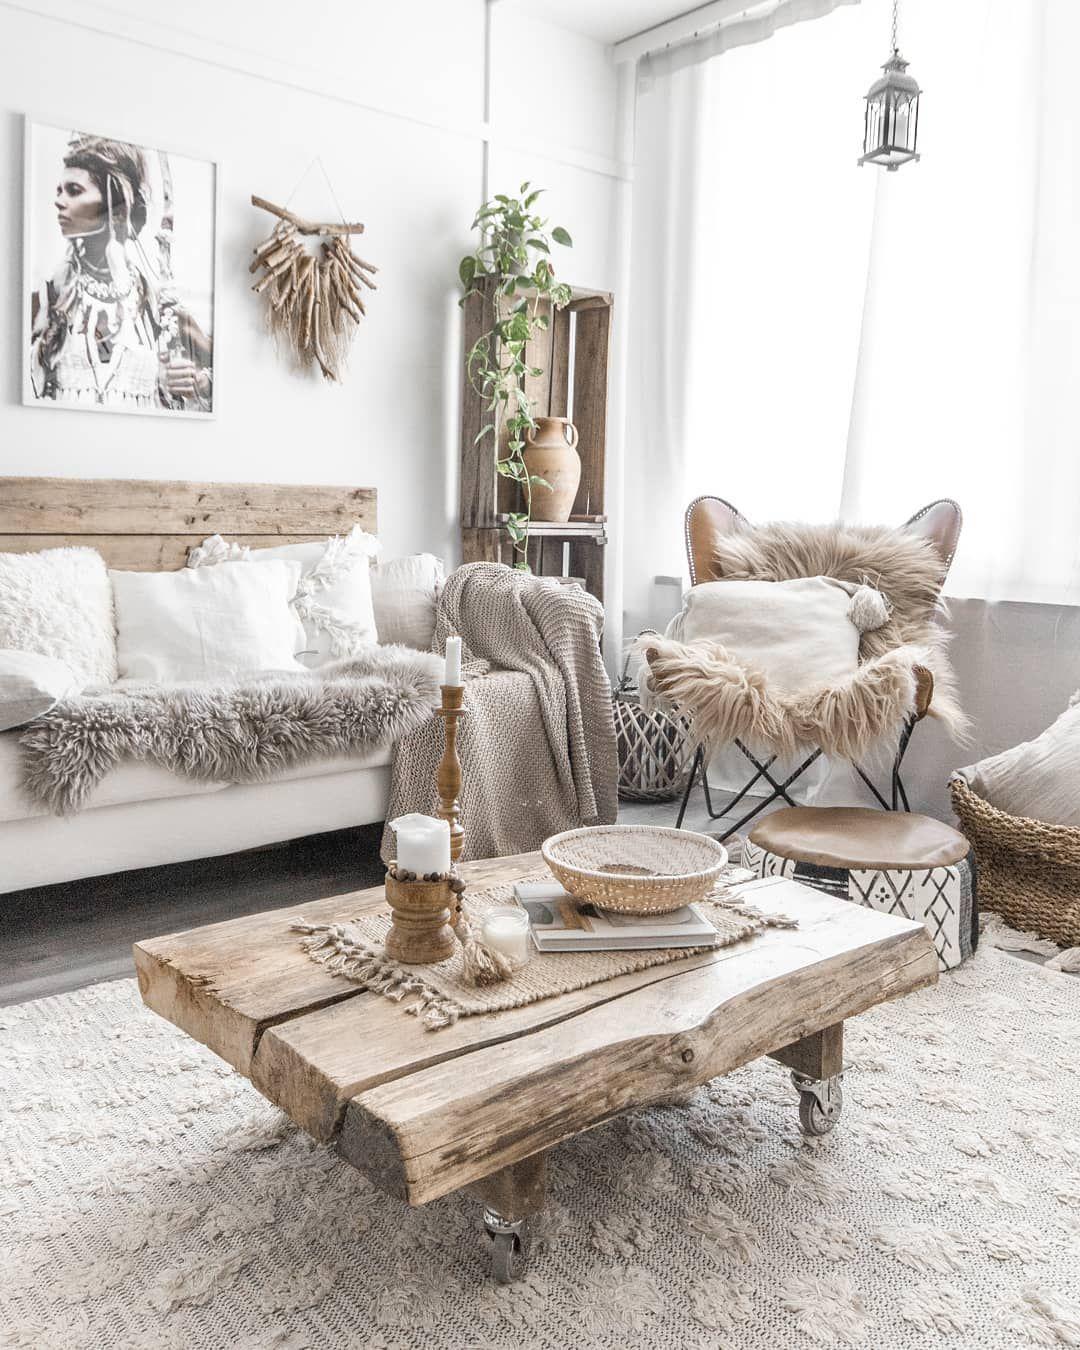 Home Decor Living Room Rustic Boho Chic Shabbychic Chic